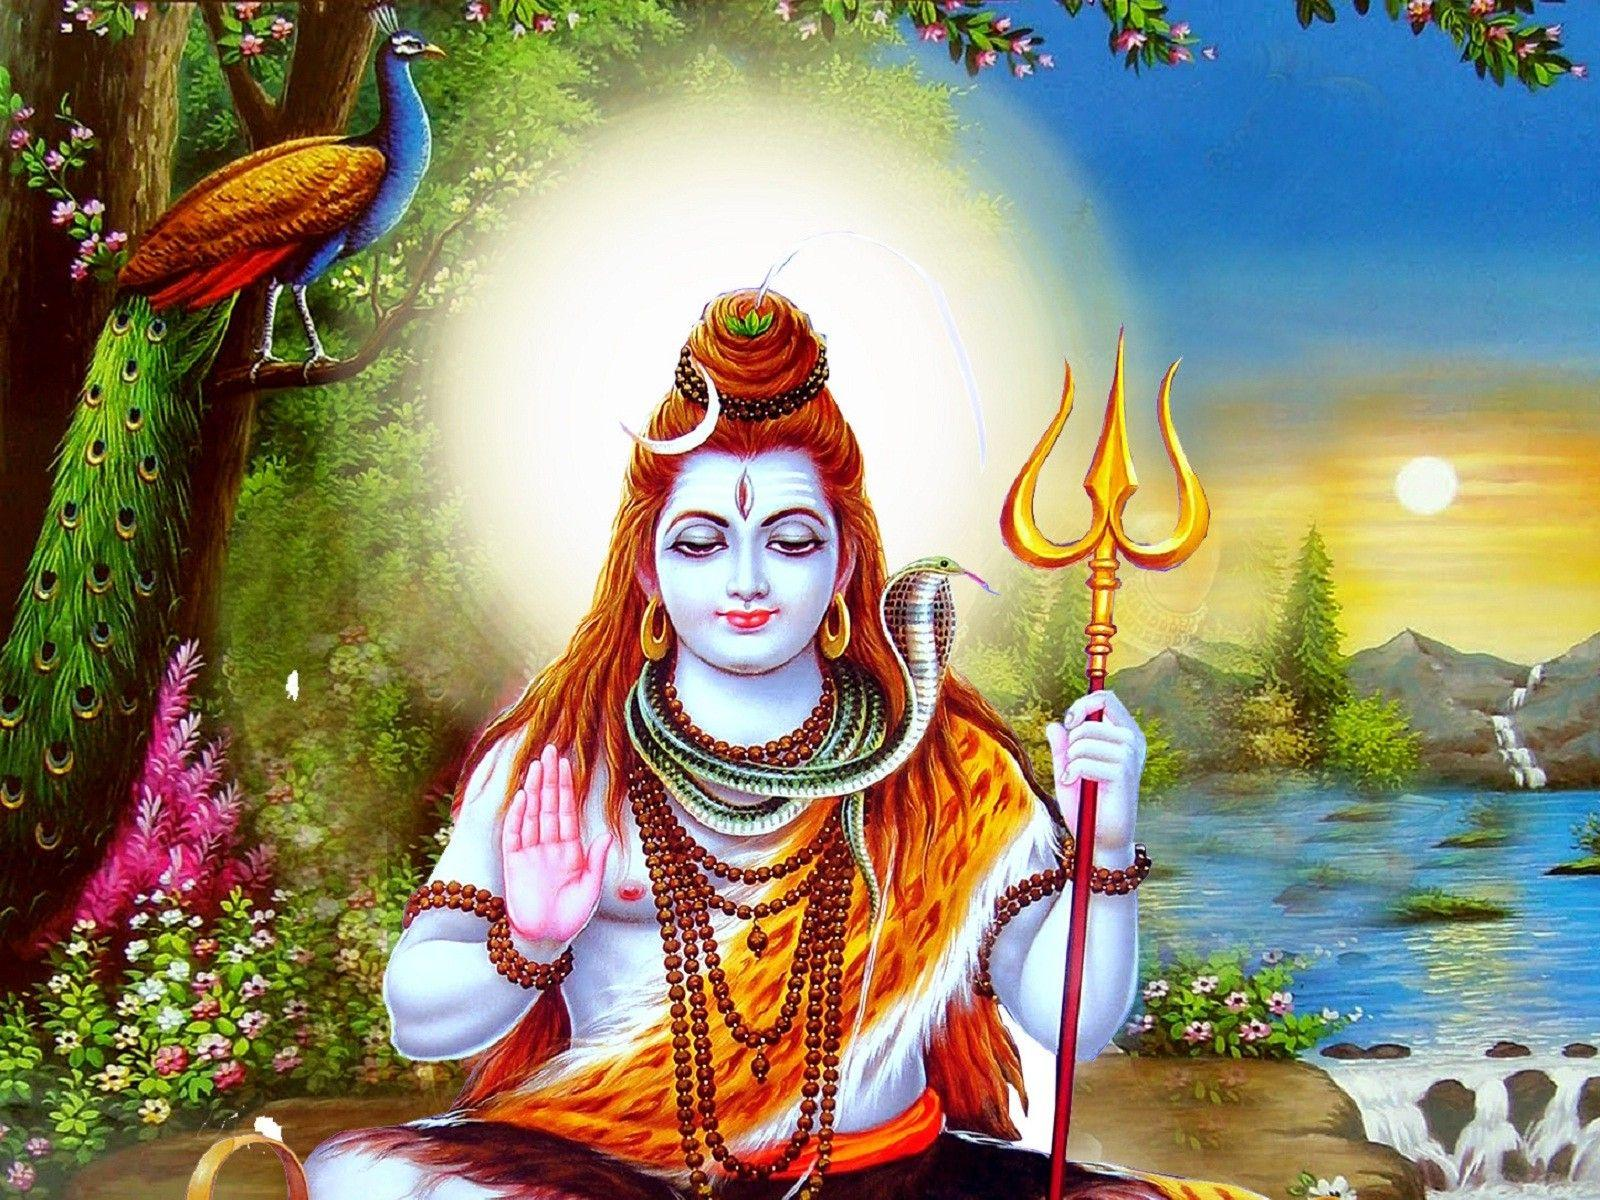 Lord Shiva Wallpaper: Lord Shiva 3D Wallpapers